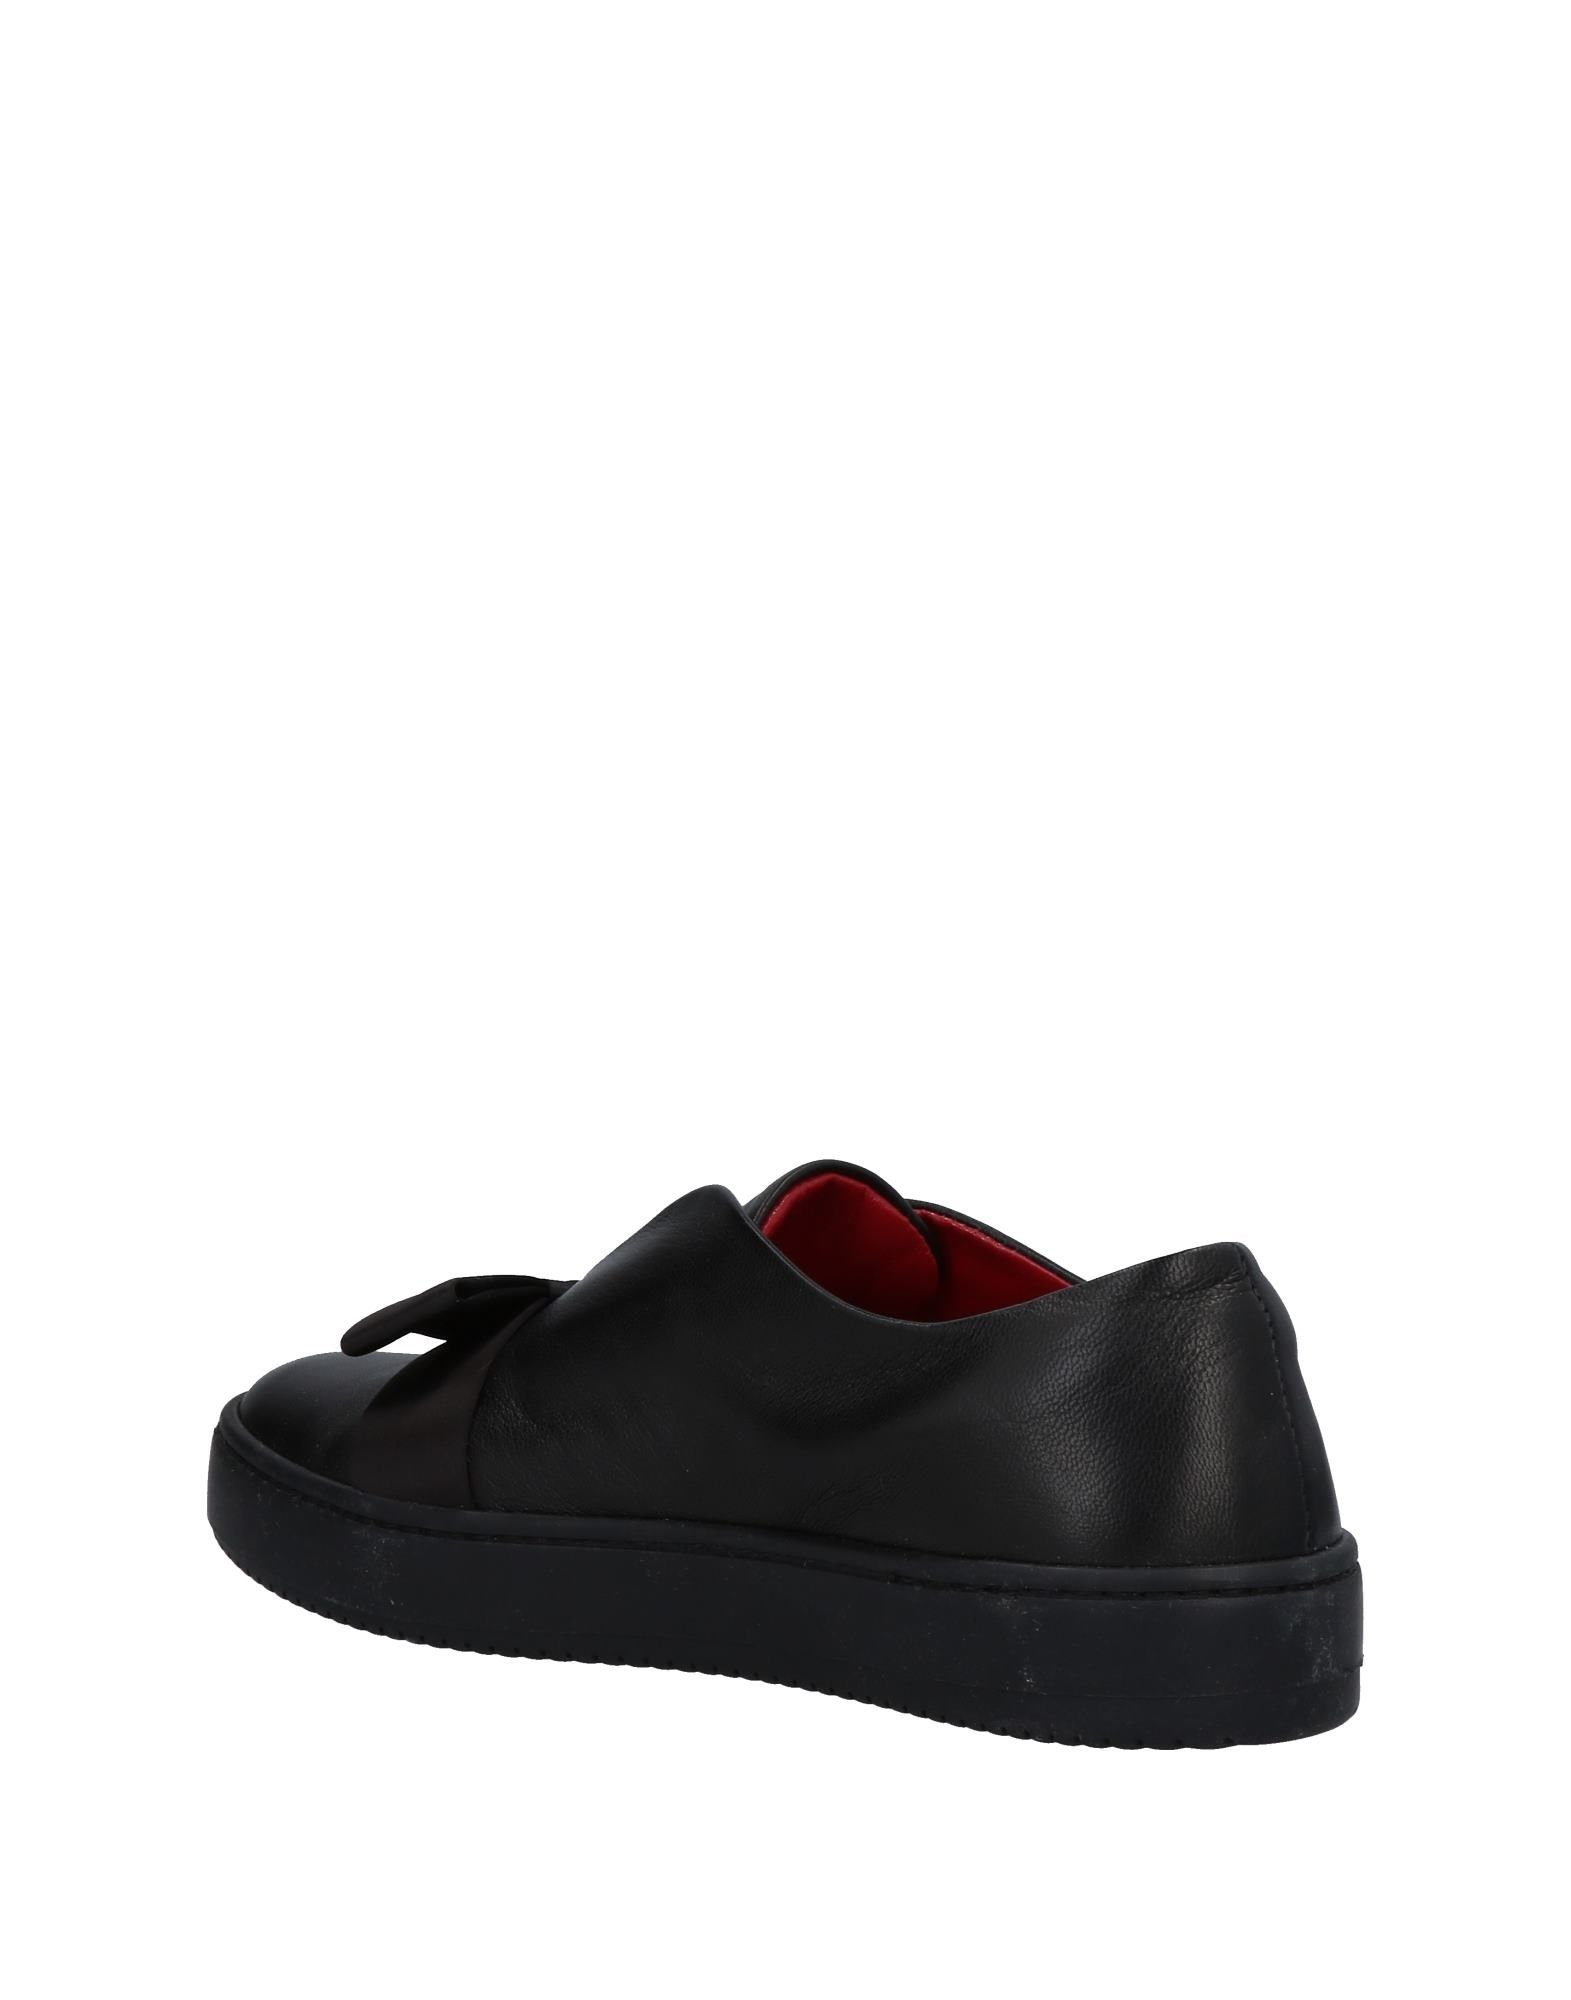 Aurora Sneakers Damen  Schuhe 11483806NU Gute Qualität beliebte Schuhe  09da52